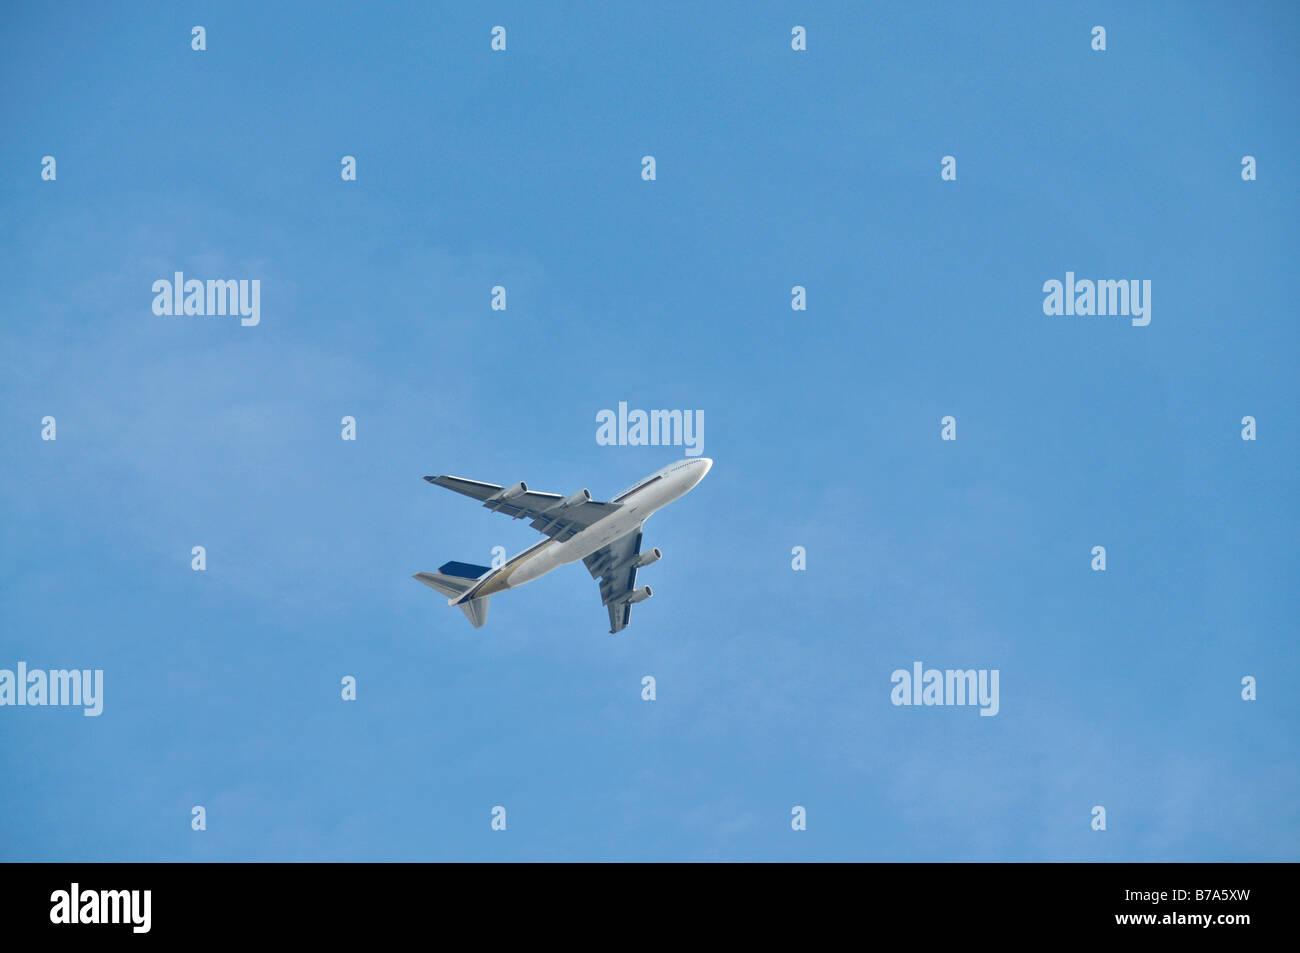 Plane on blue sky - Stock Image